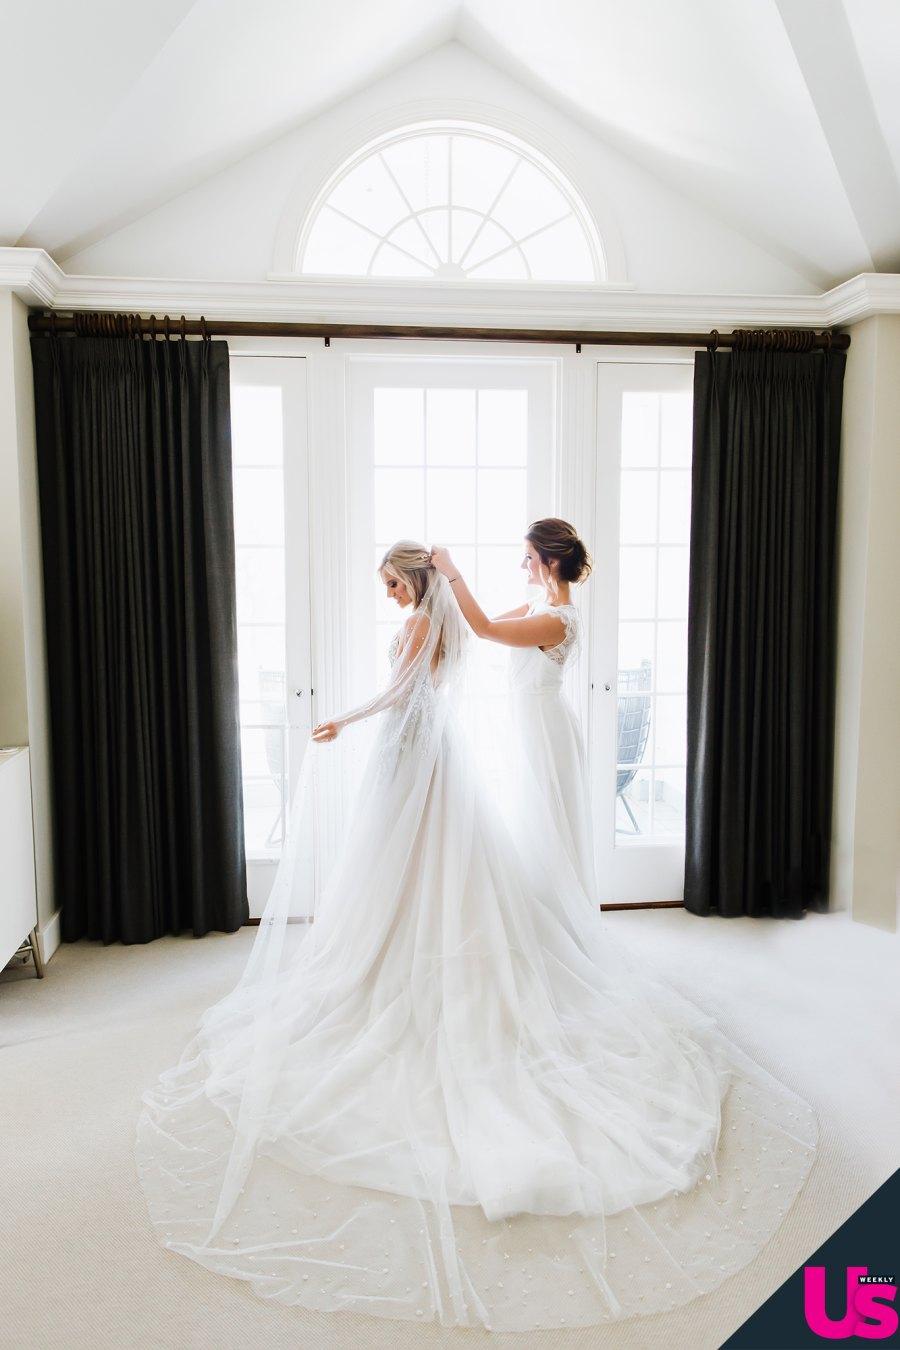 Arie-Luyendyk-Jr.-and-Lauren-Burnham-Wedding